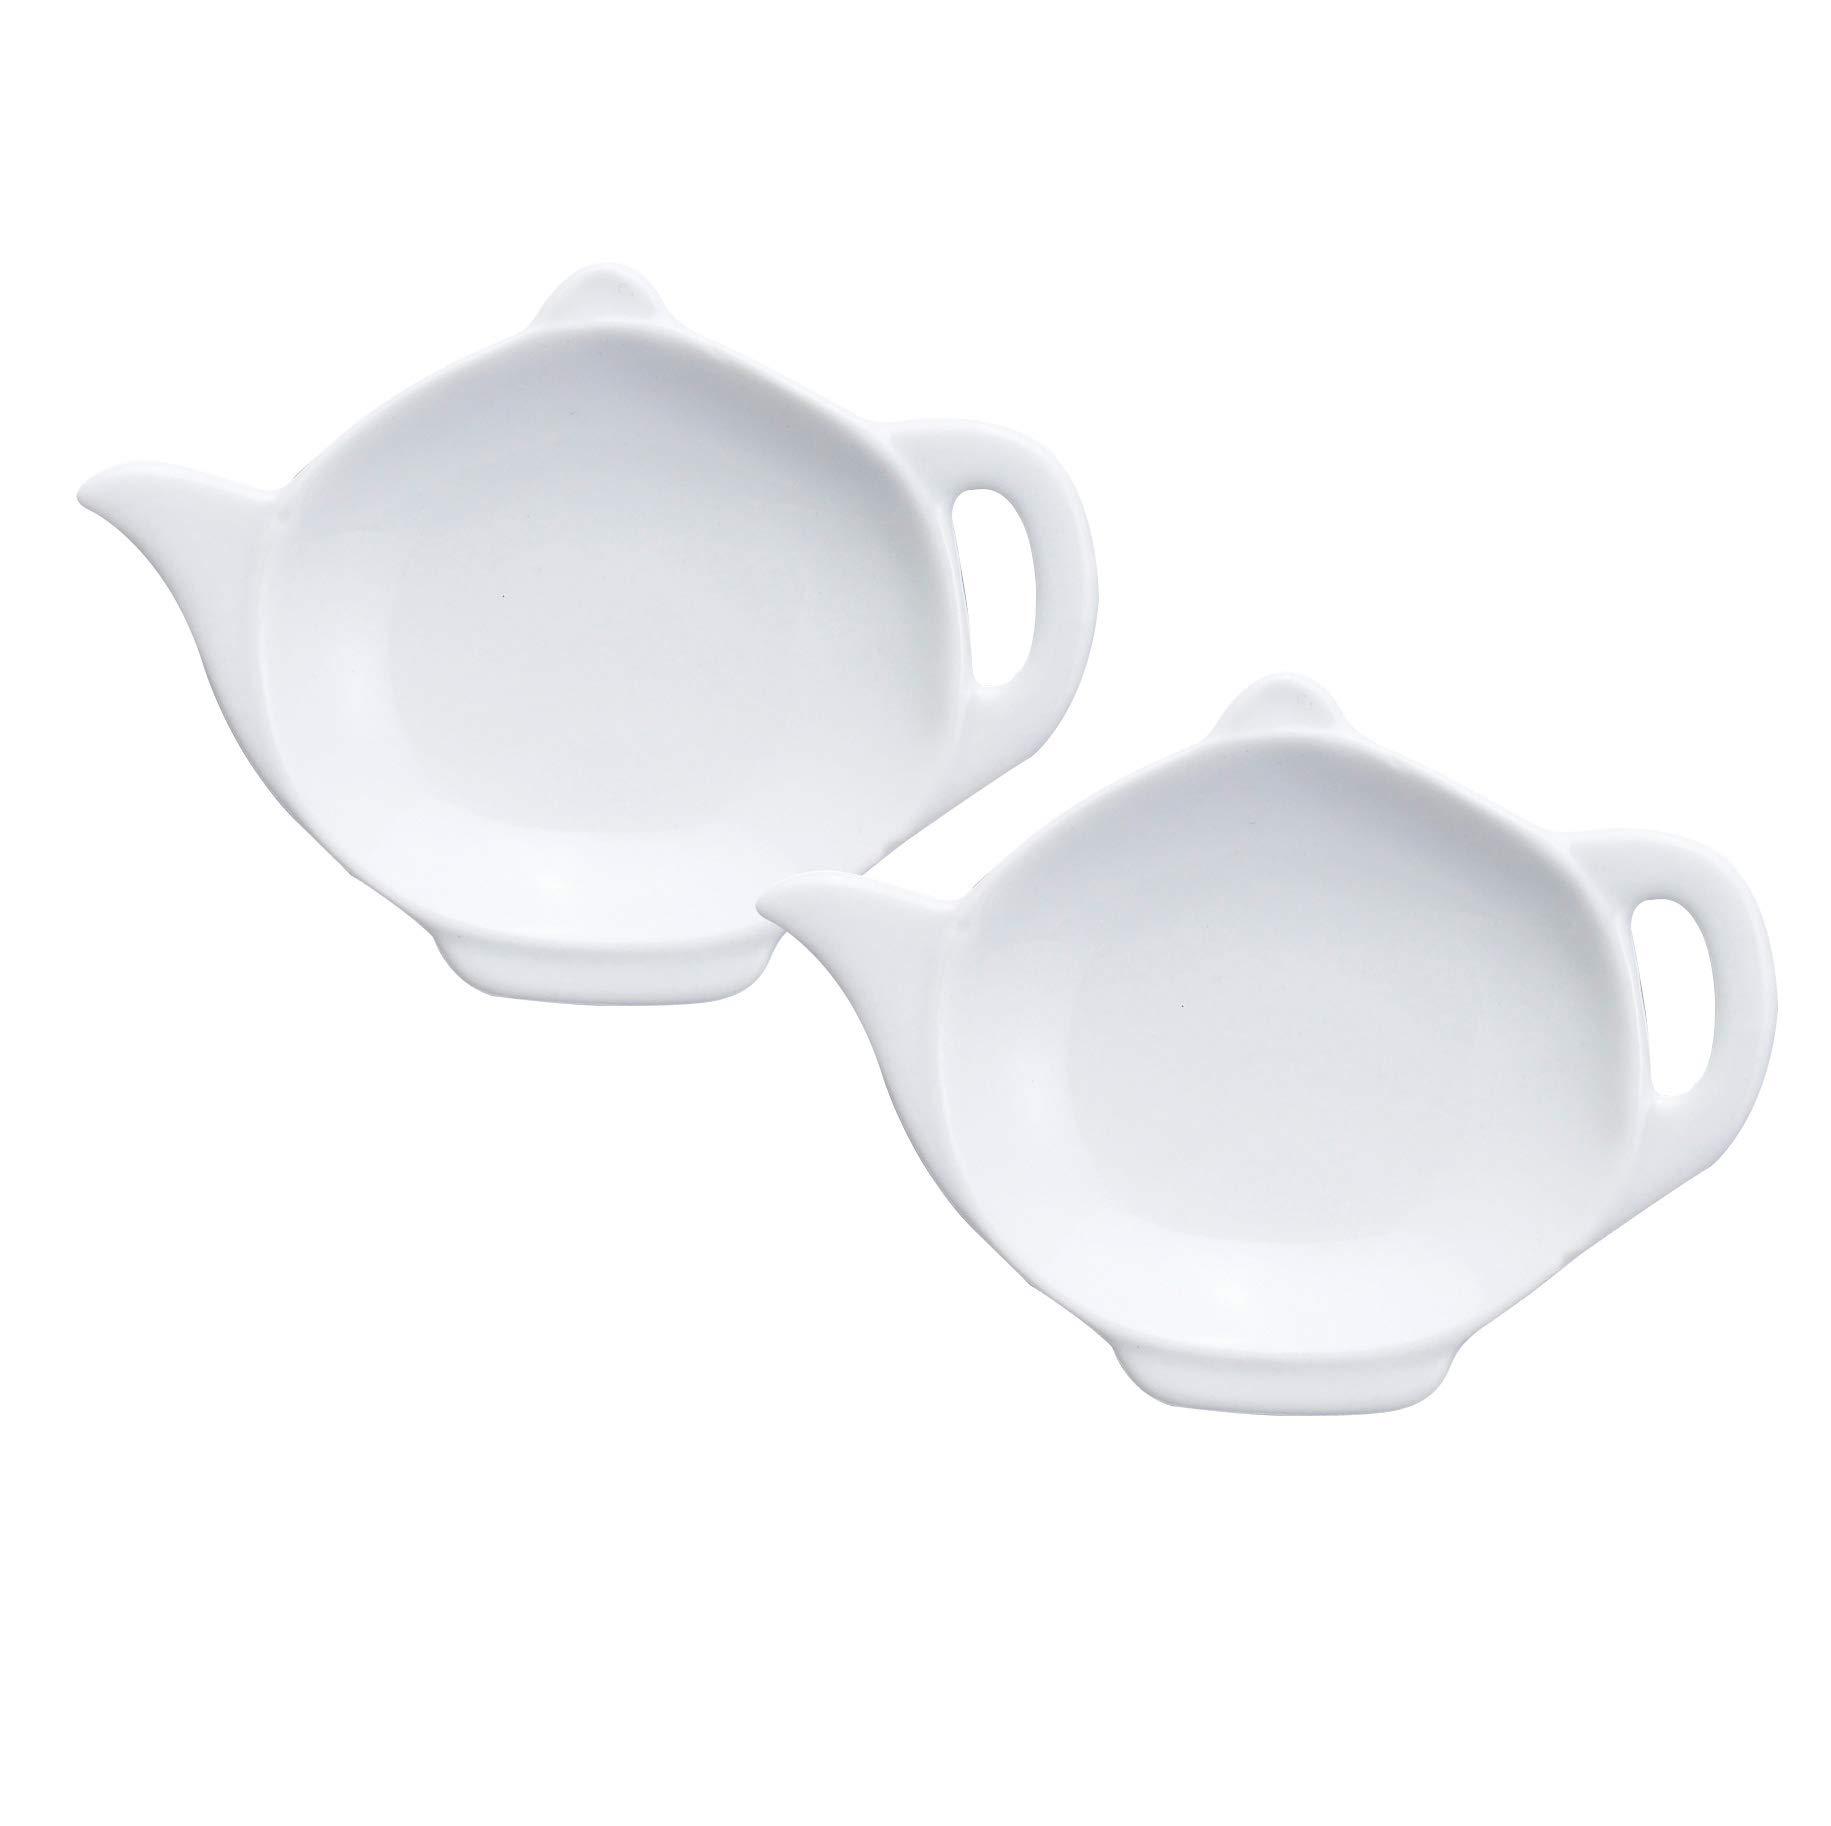 HIC Harold Import Co. 75/19/2 HIC Teapot-Shaped Tea Bag Holder and Resting Caddy Set of 2 Fine White Porcelain